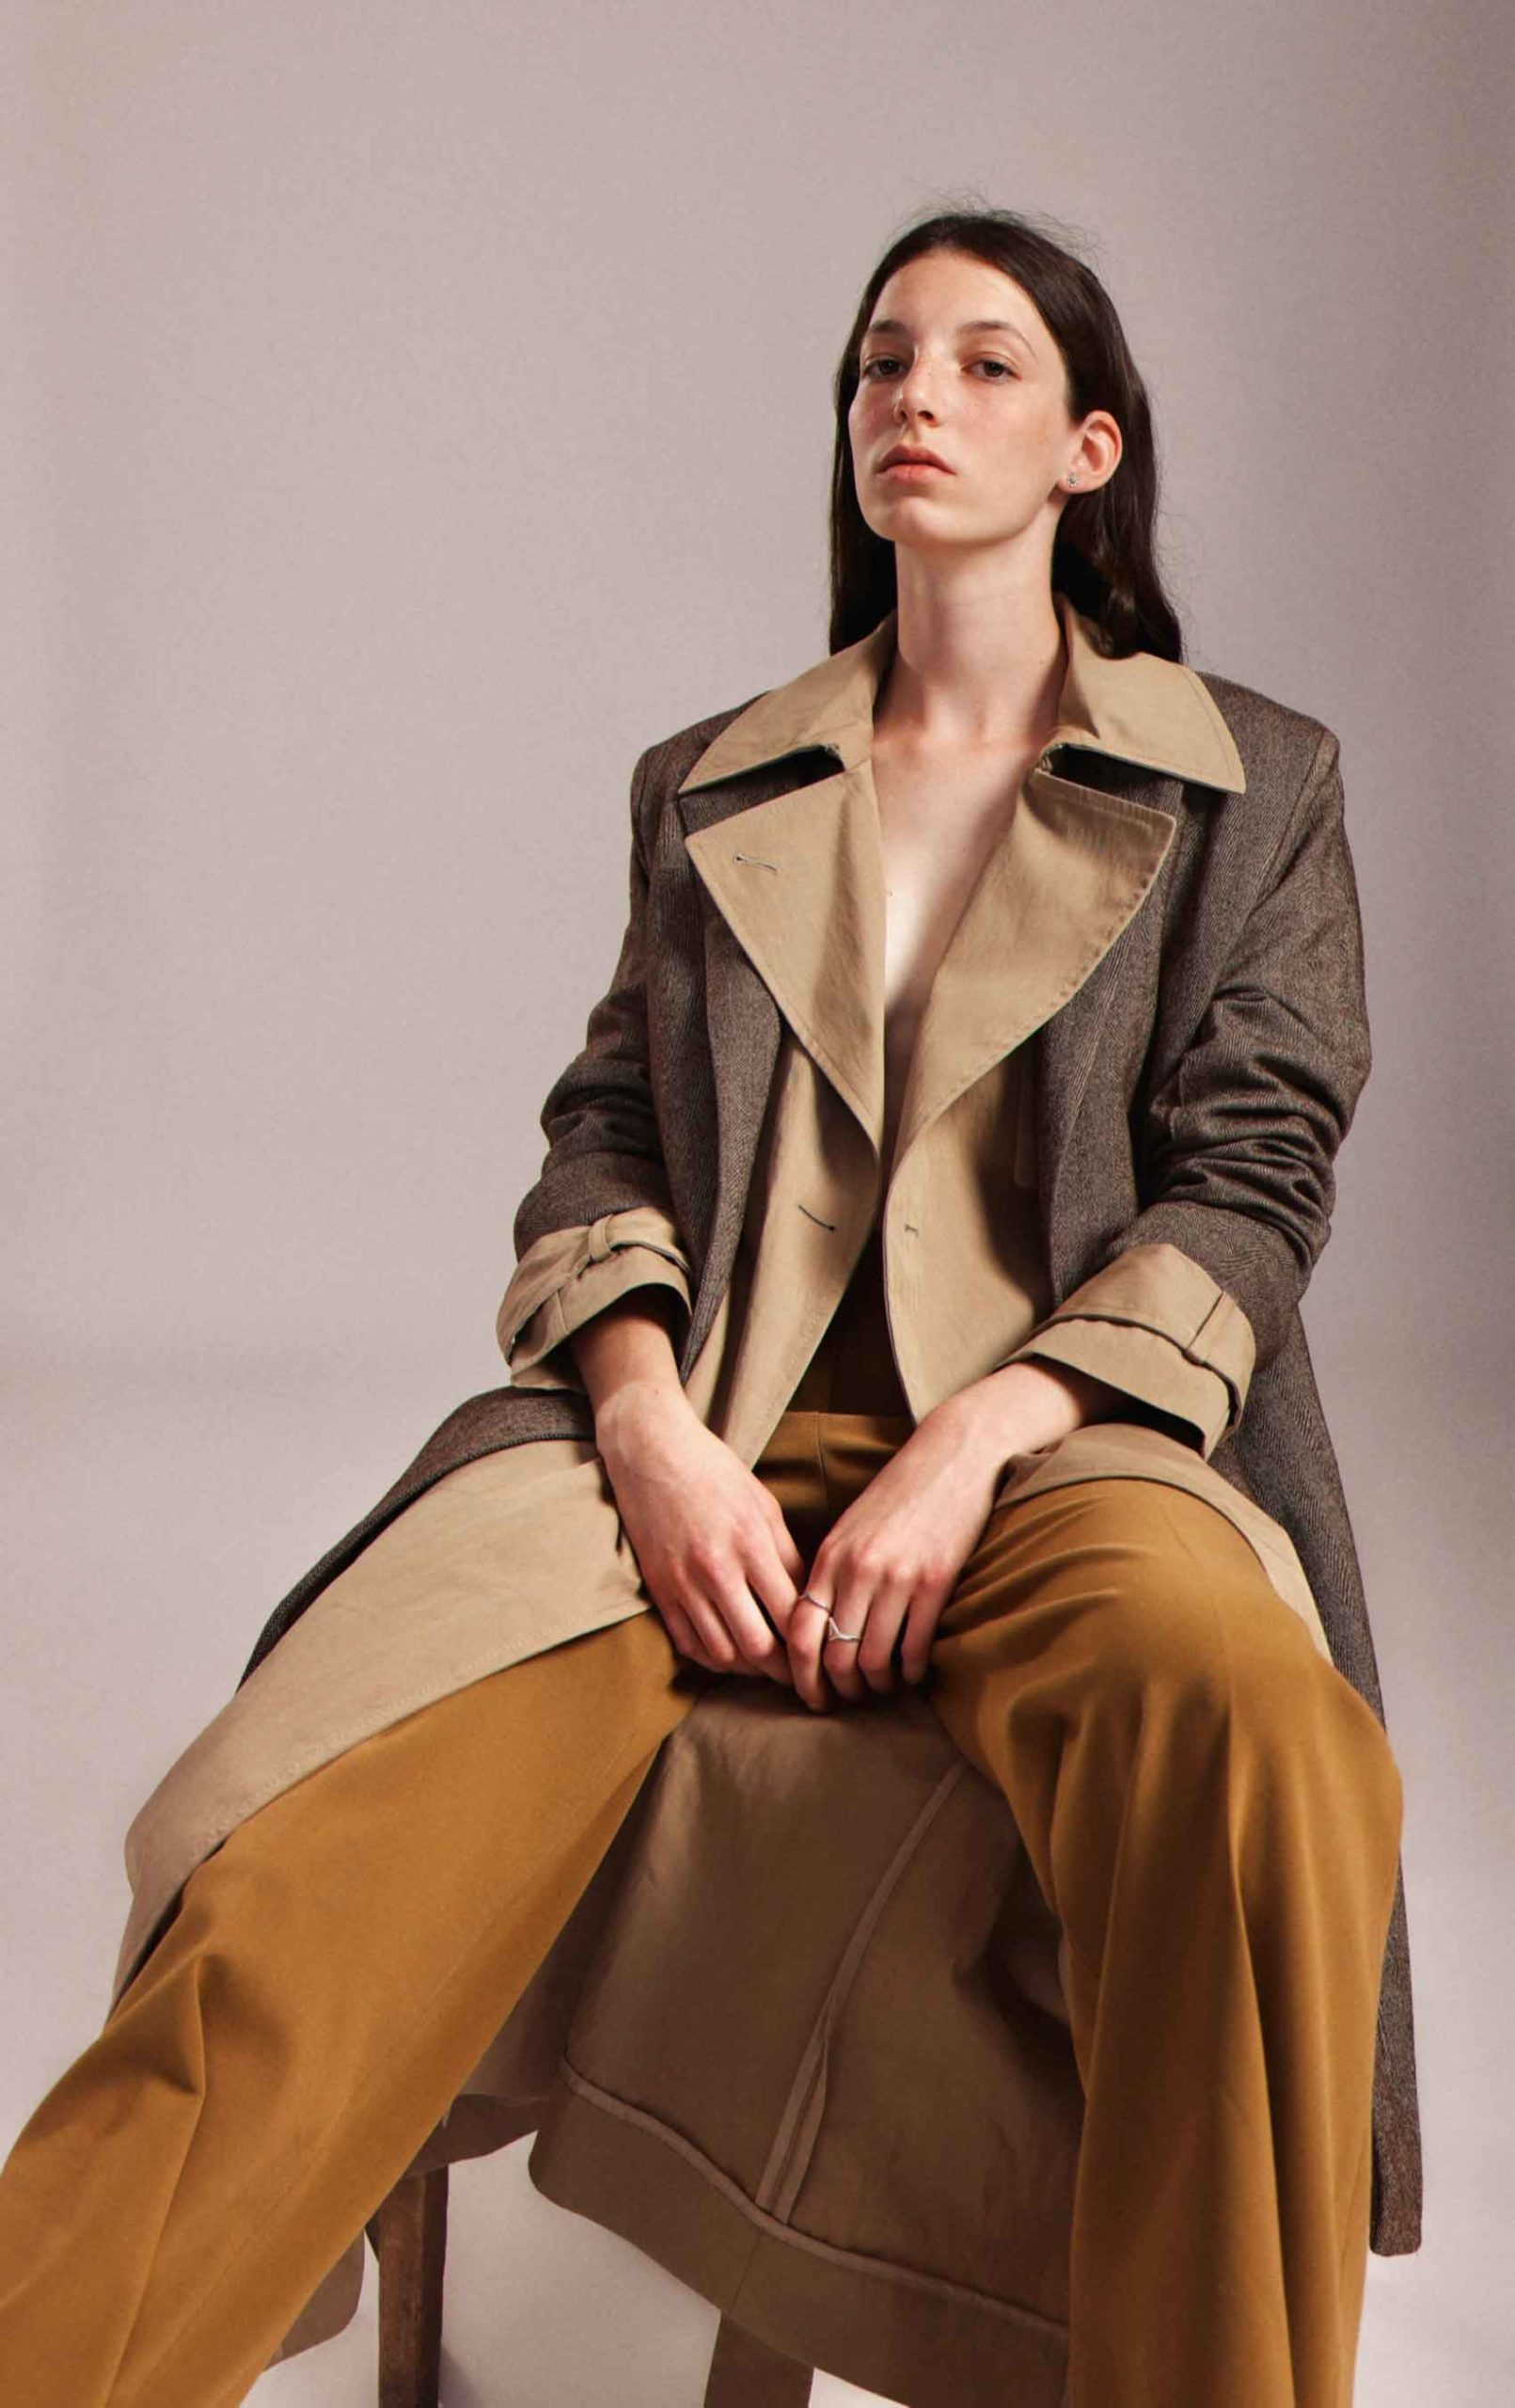 Photographer- Oz Shemesh, Styling - Maor Rabin, Hair - Maor kidushim Agency - yuligroup - Fashion Israel - מגזין אופנה ישראלי-111